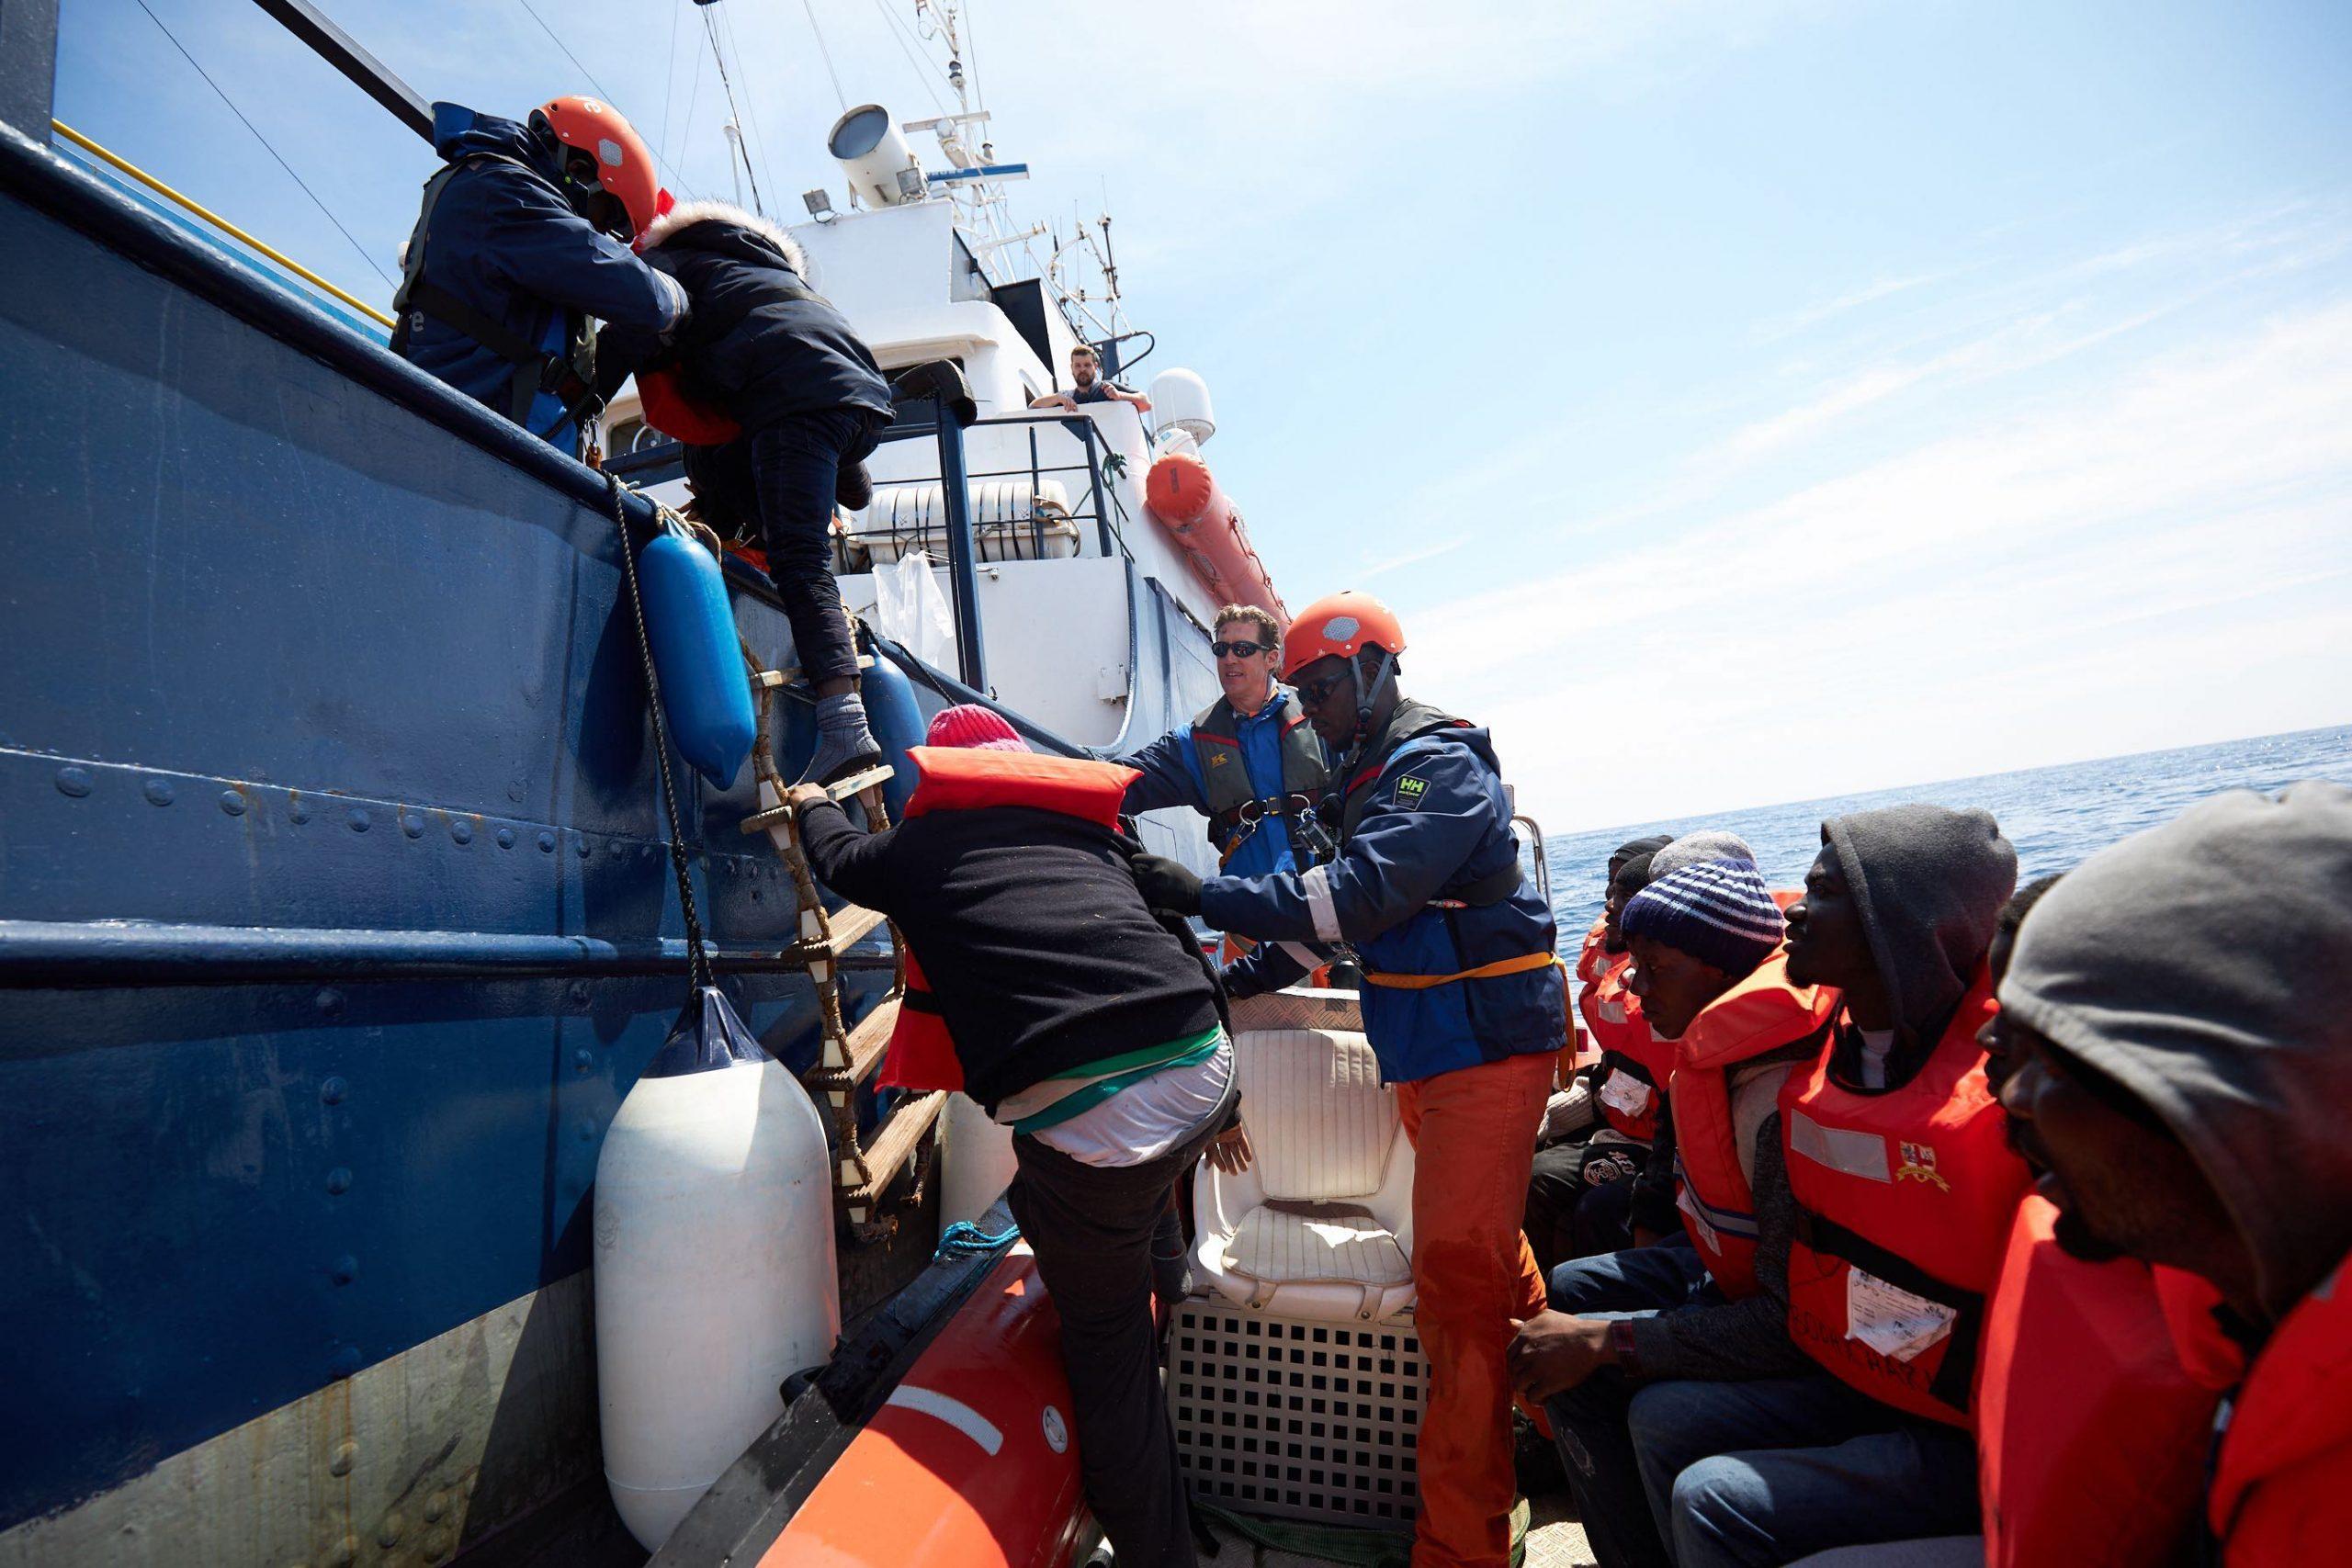 Alan Kurdi conducting rescue